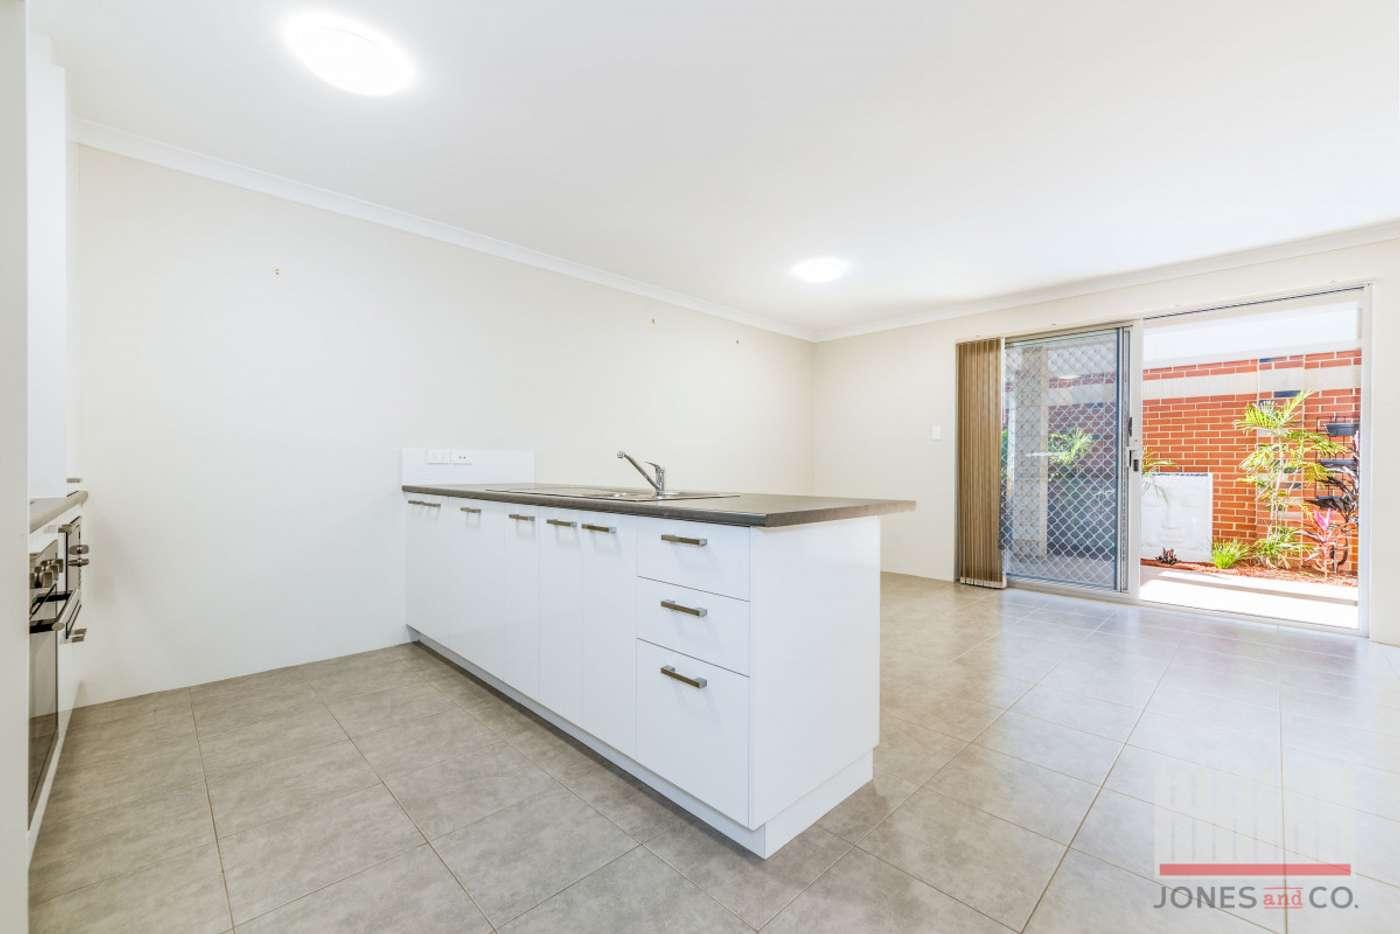 Main view of Homely villa listing, 24/12 Loder Way, South Guildford WA 6055